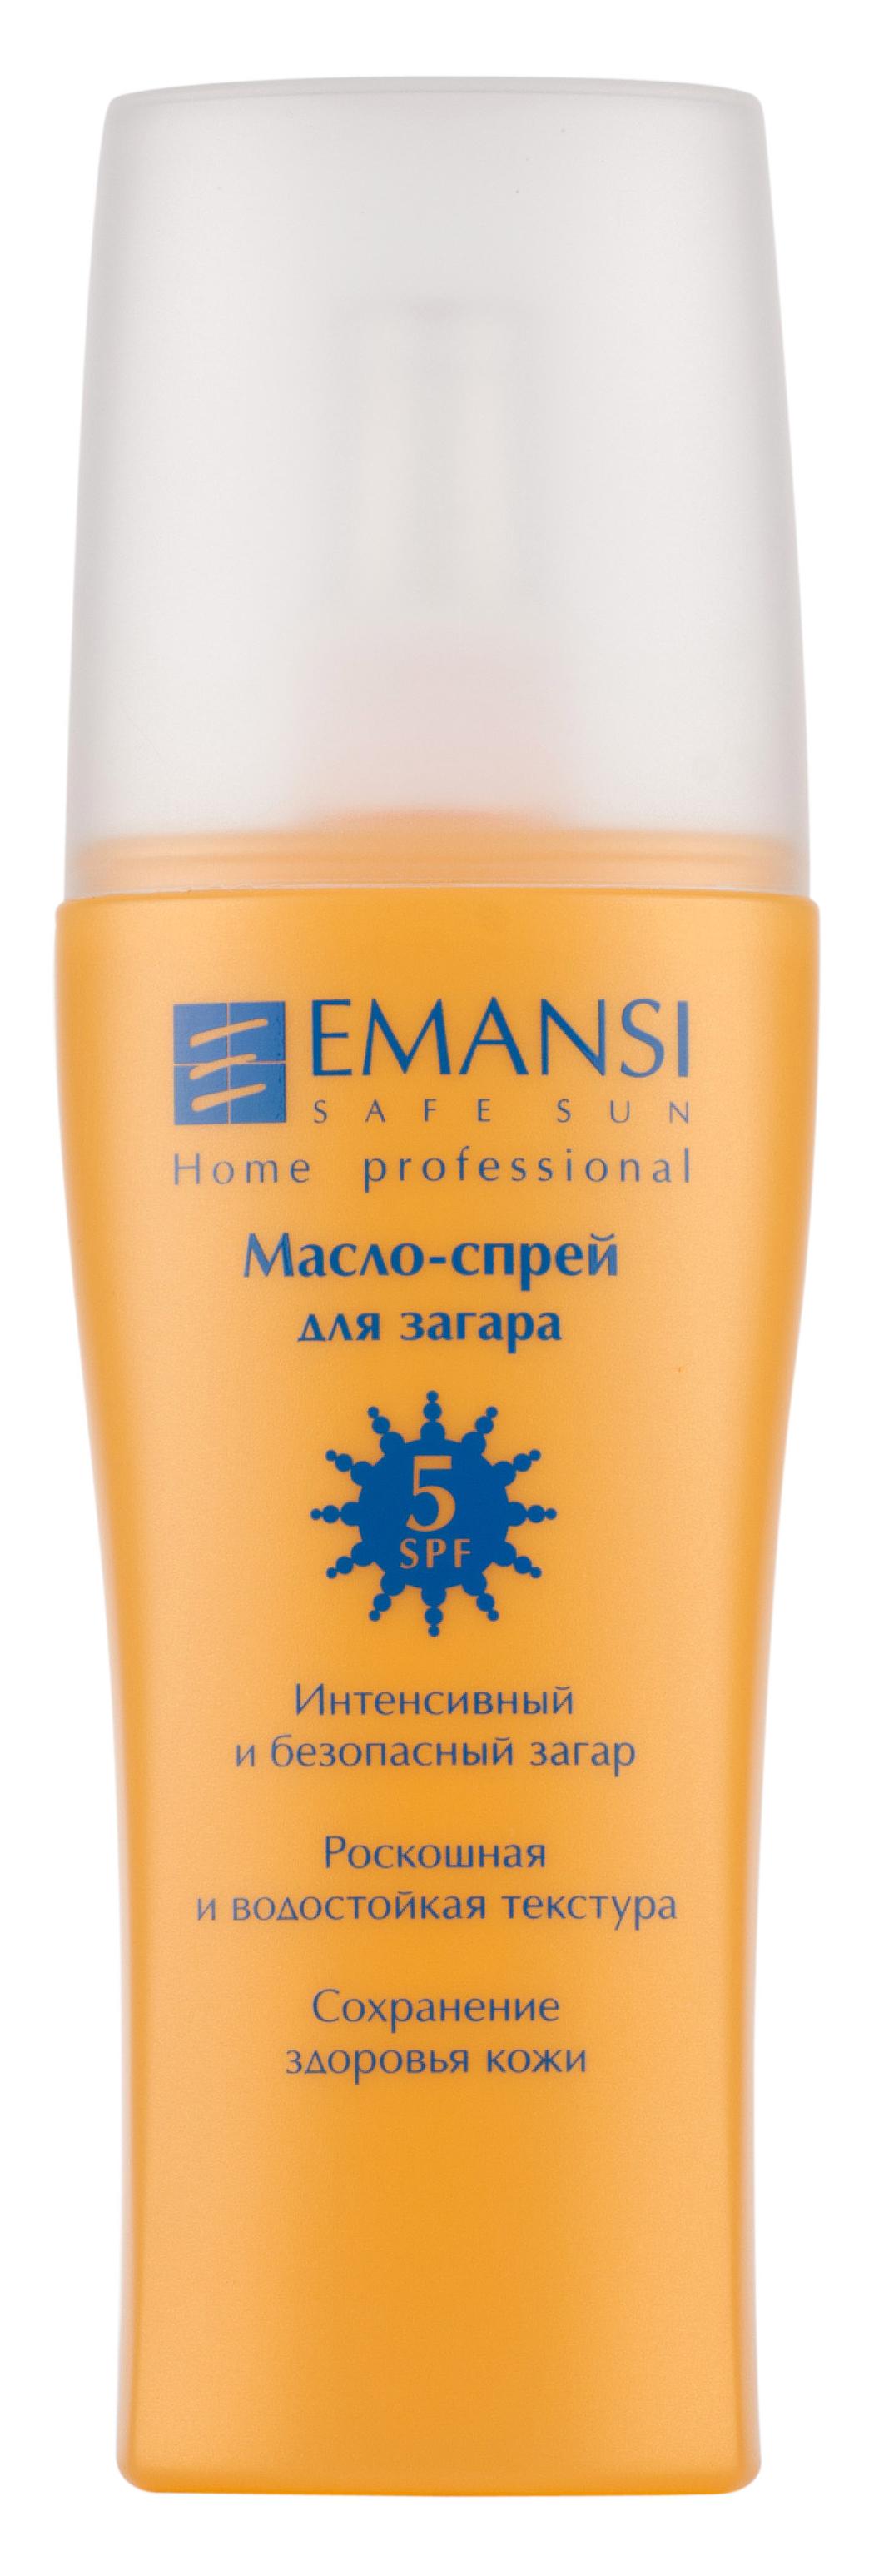 "Emansi Масло-спрей для загара ""Safe sun"" SPF 5, 150 мл 3328"